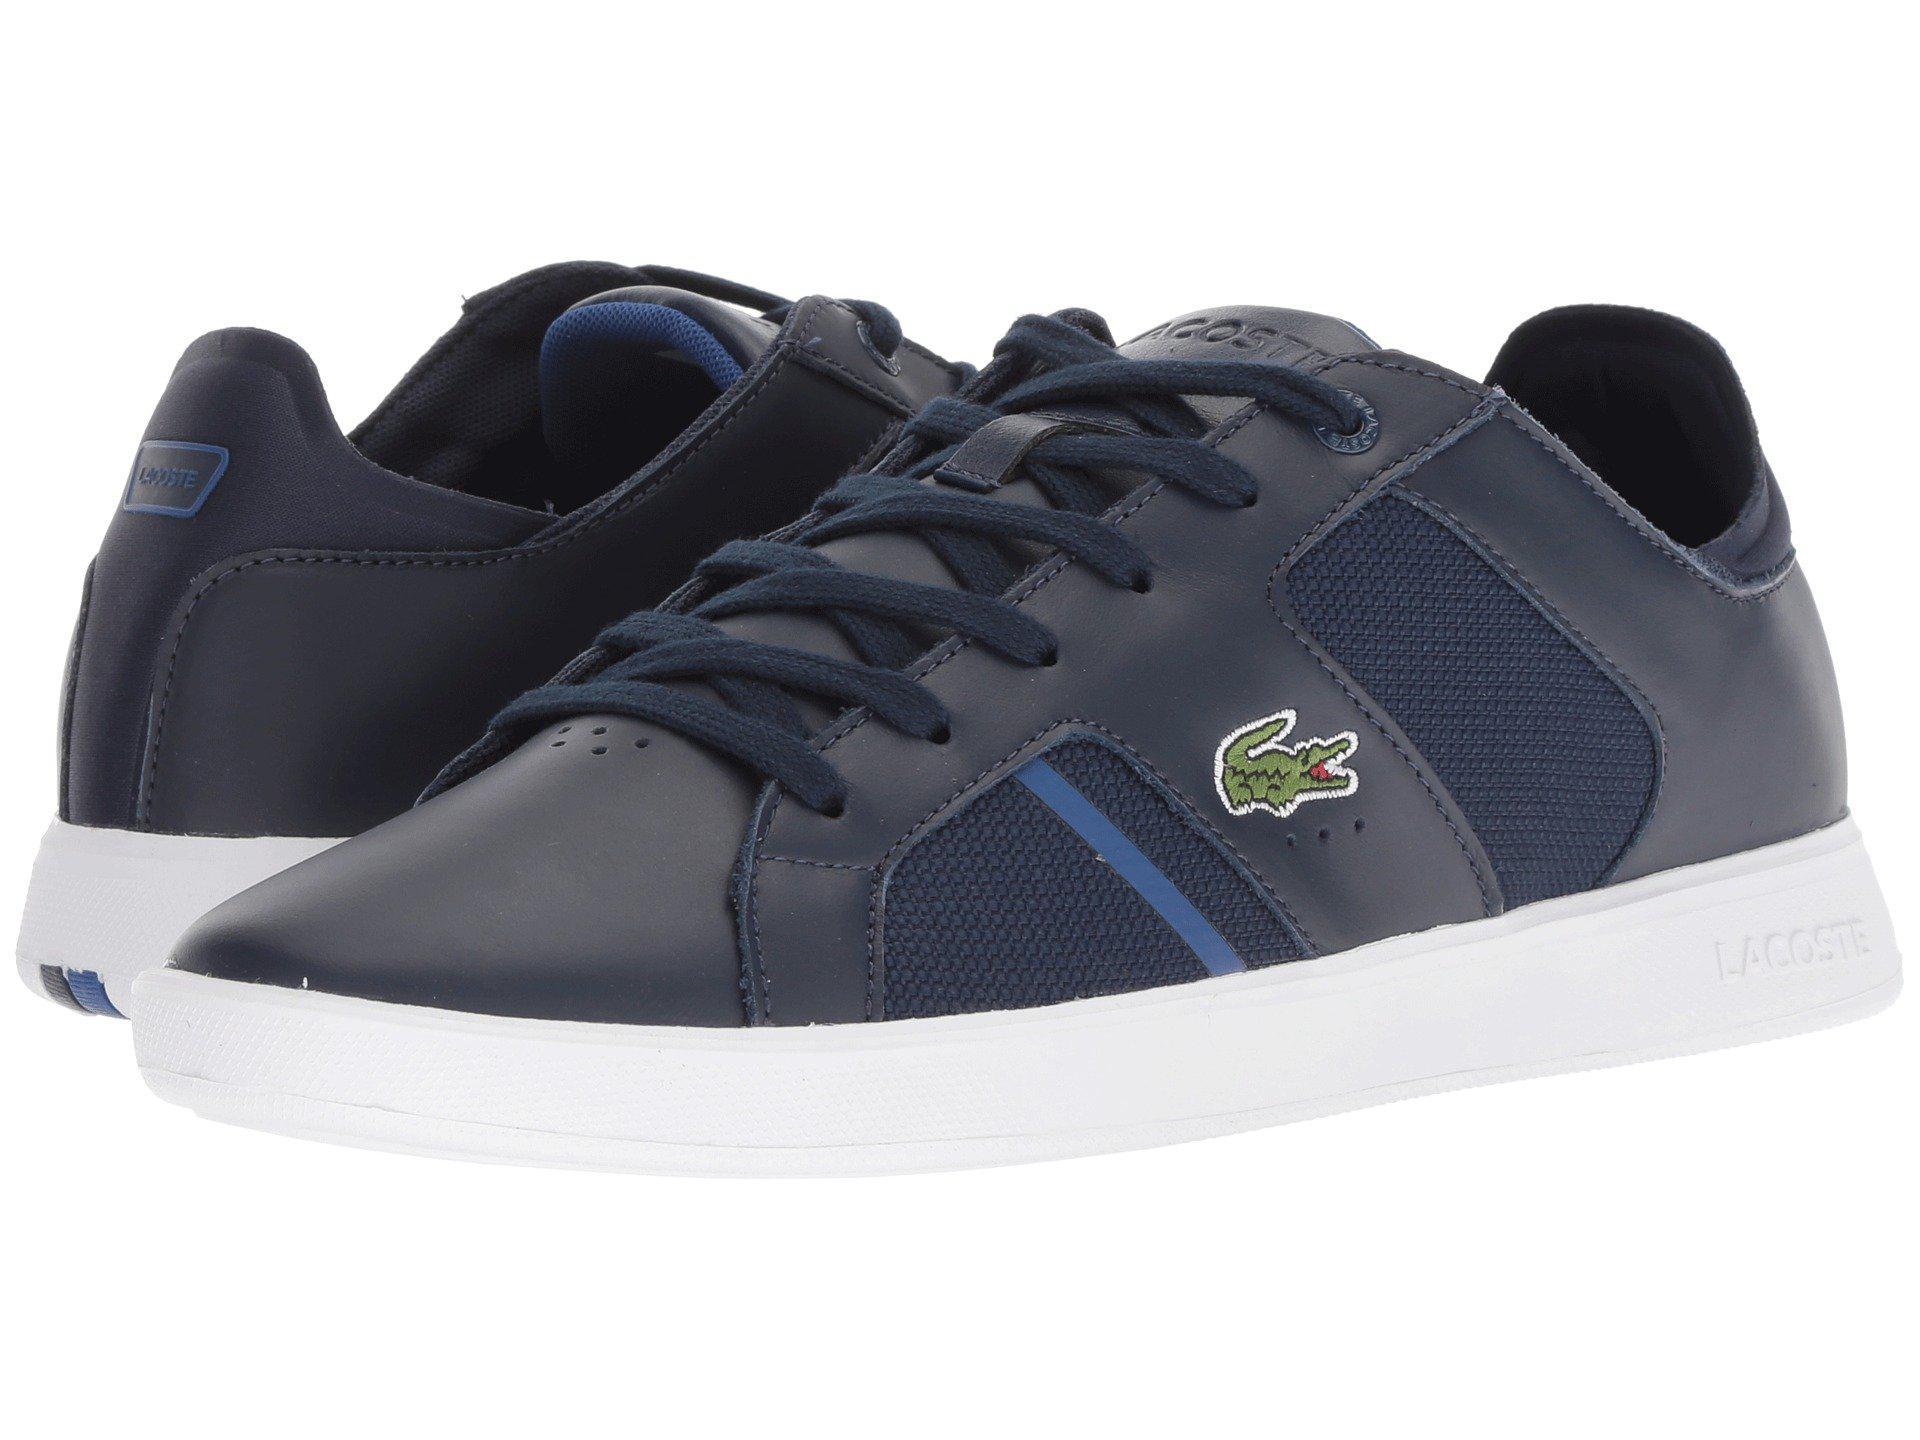 7f7e9fcf6 Lyst - Lacoste Novas 318 2 (black grey) Men s Shoes in Blue for Men